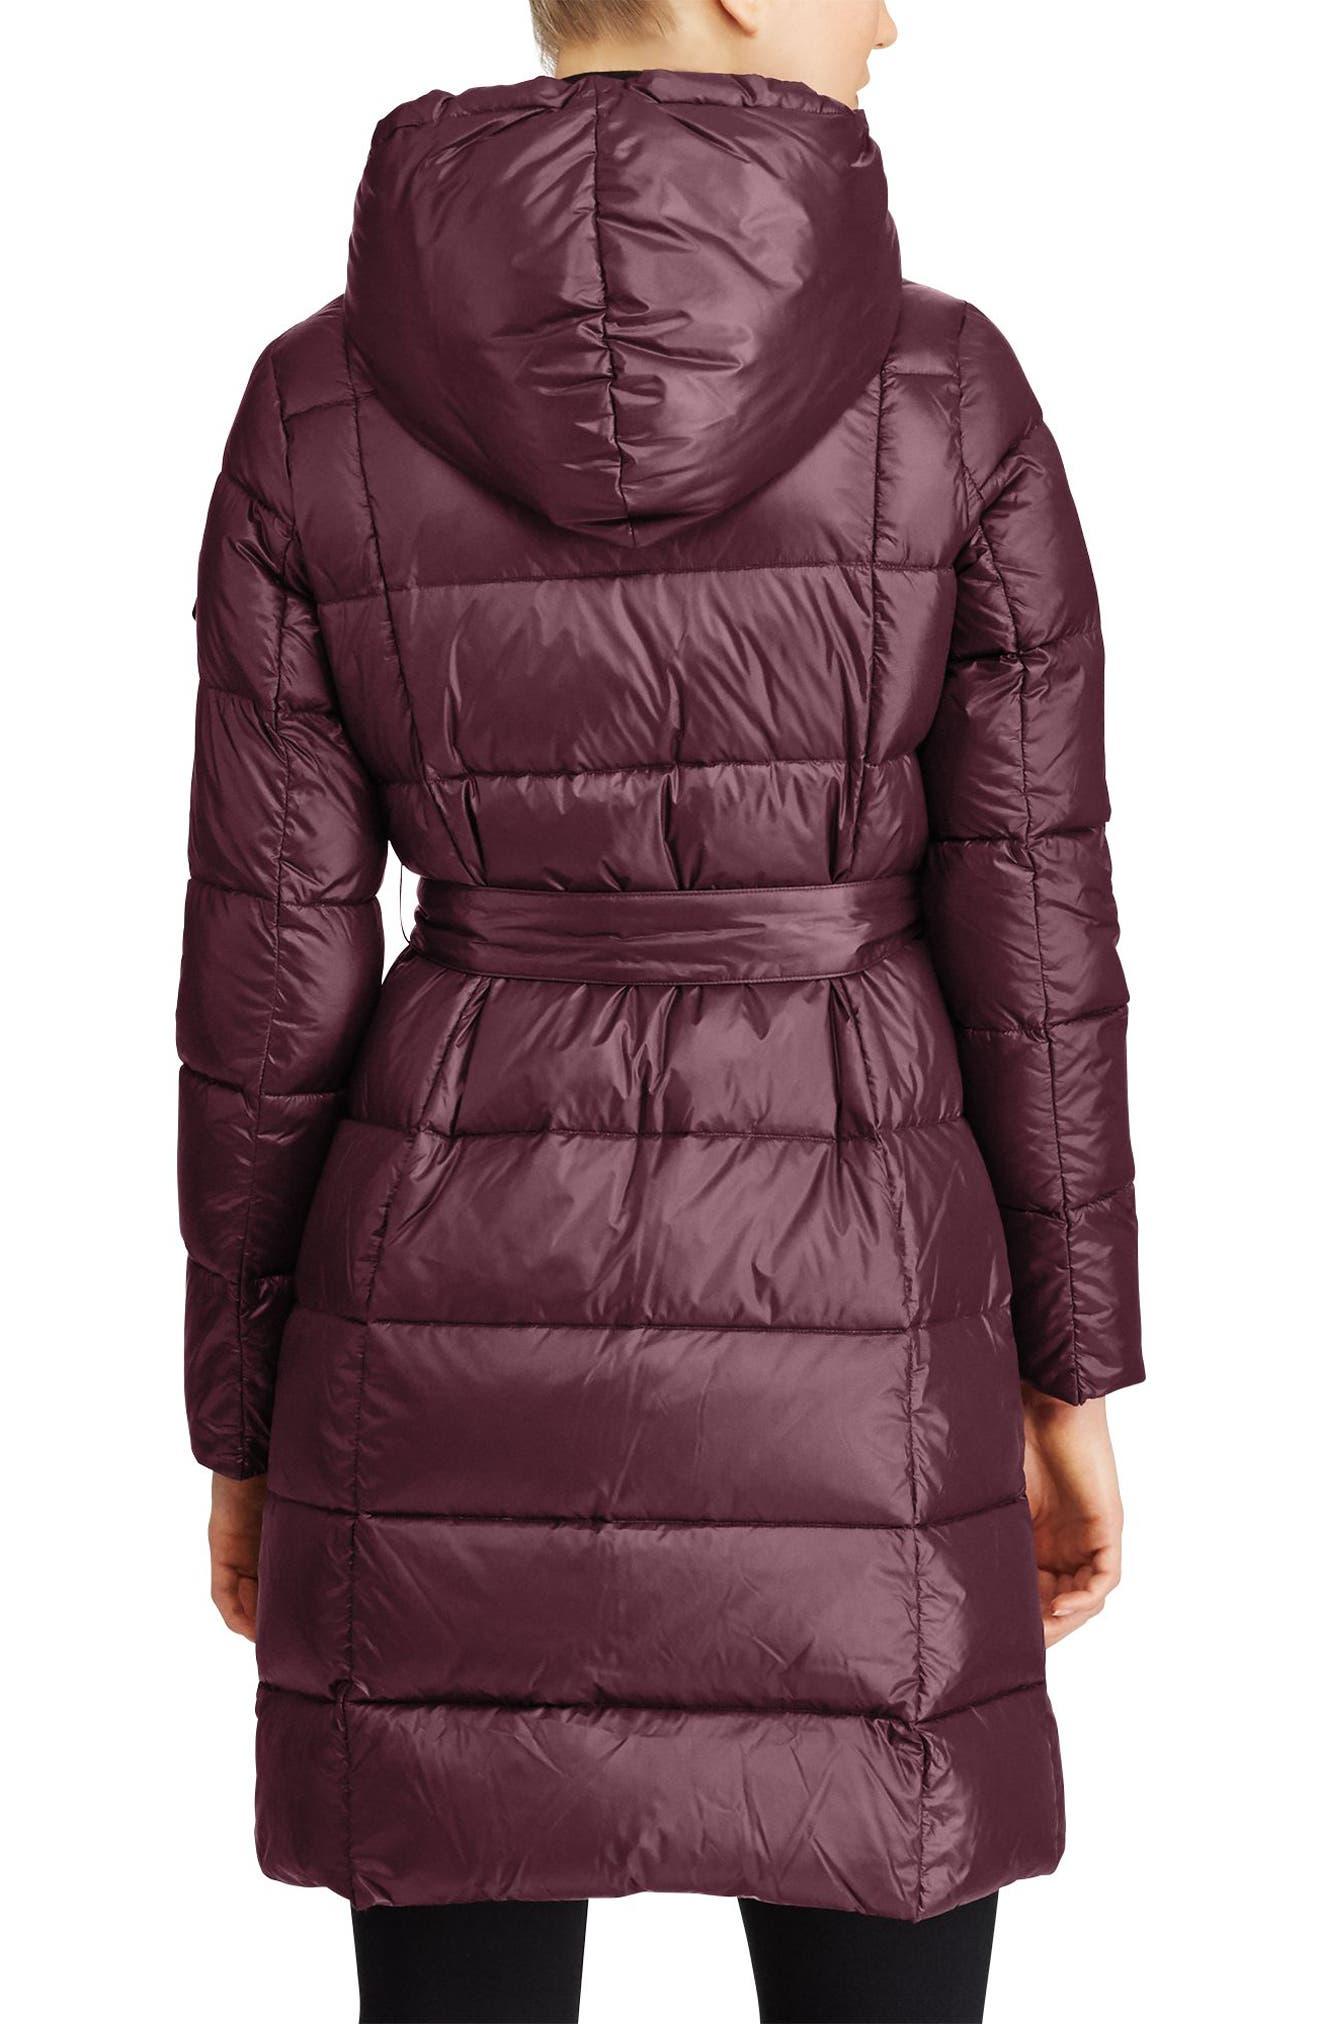 Packable Belted Down Jacket,                             Alternate thumbnail 3, color,                             Burgundy/ Aubergine